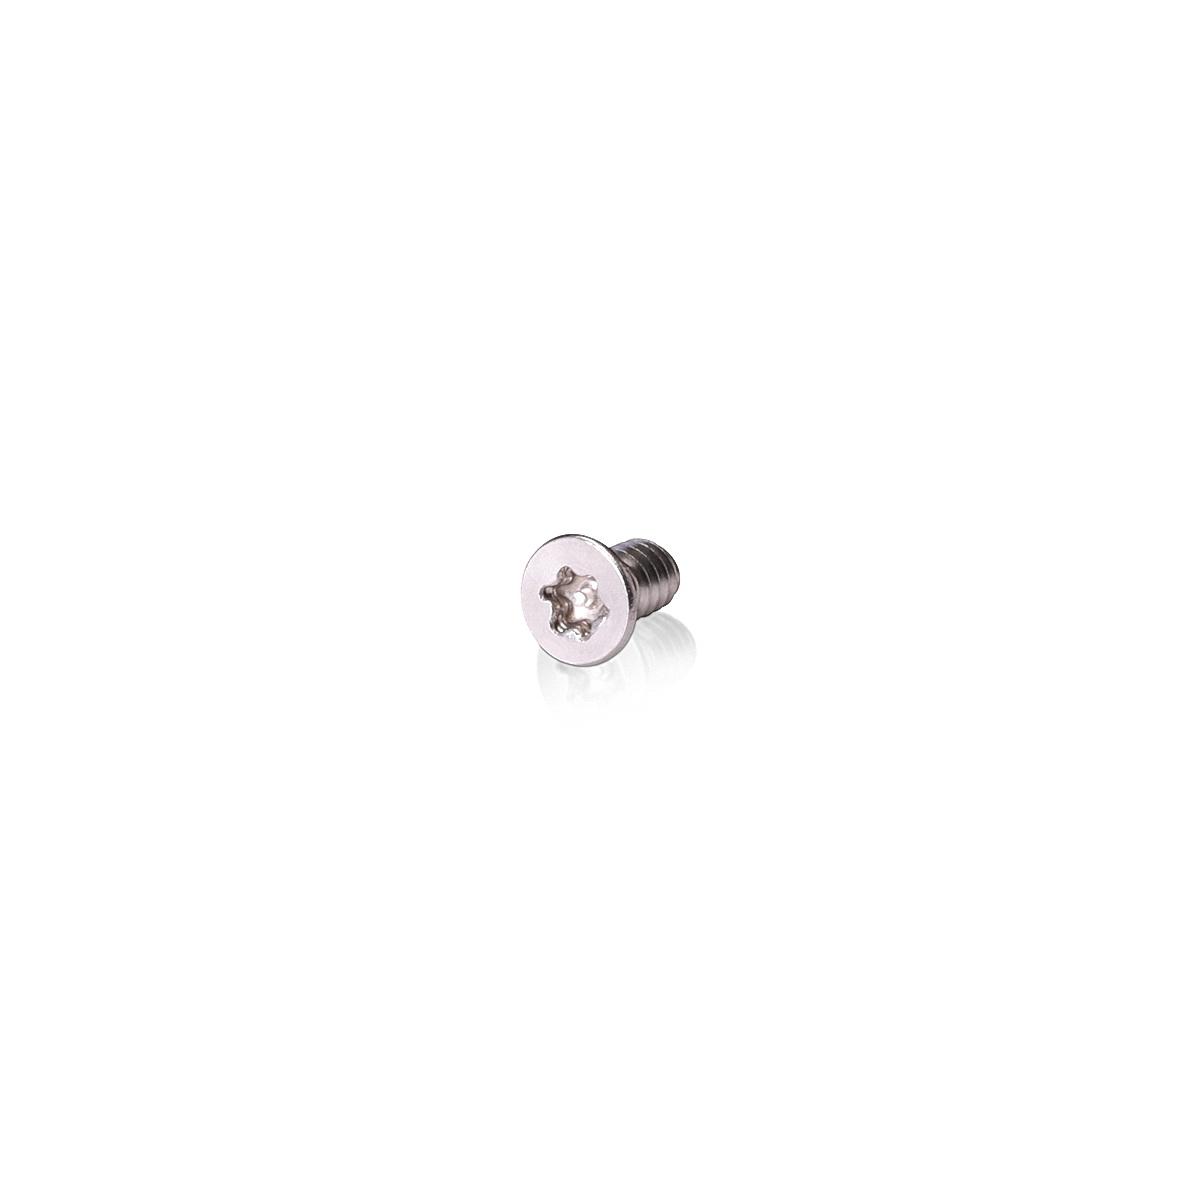 #10-24 x 3/8''   Torx   Flat Head   Machine Screws   Stainless Steel 18-8